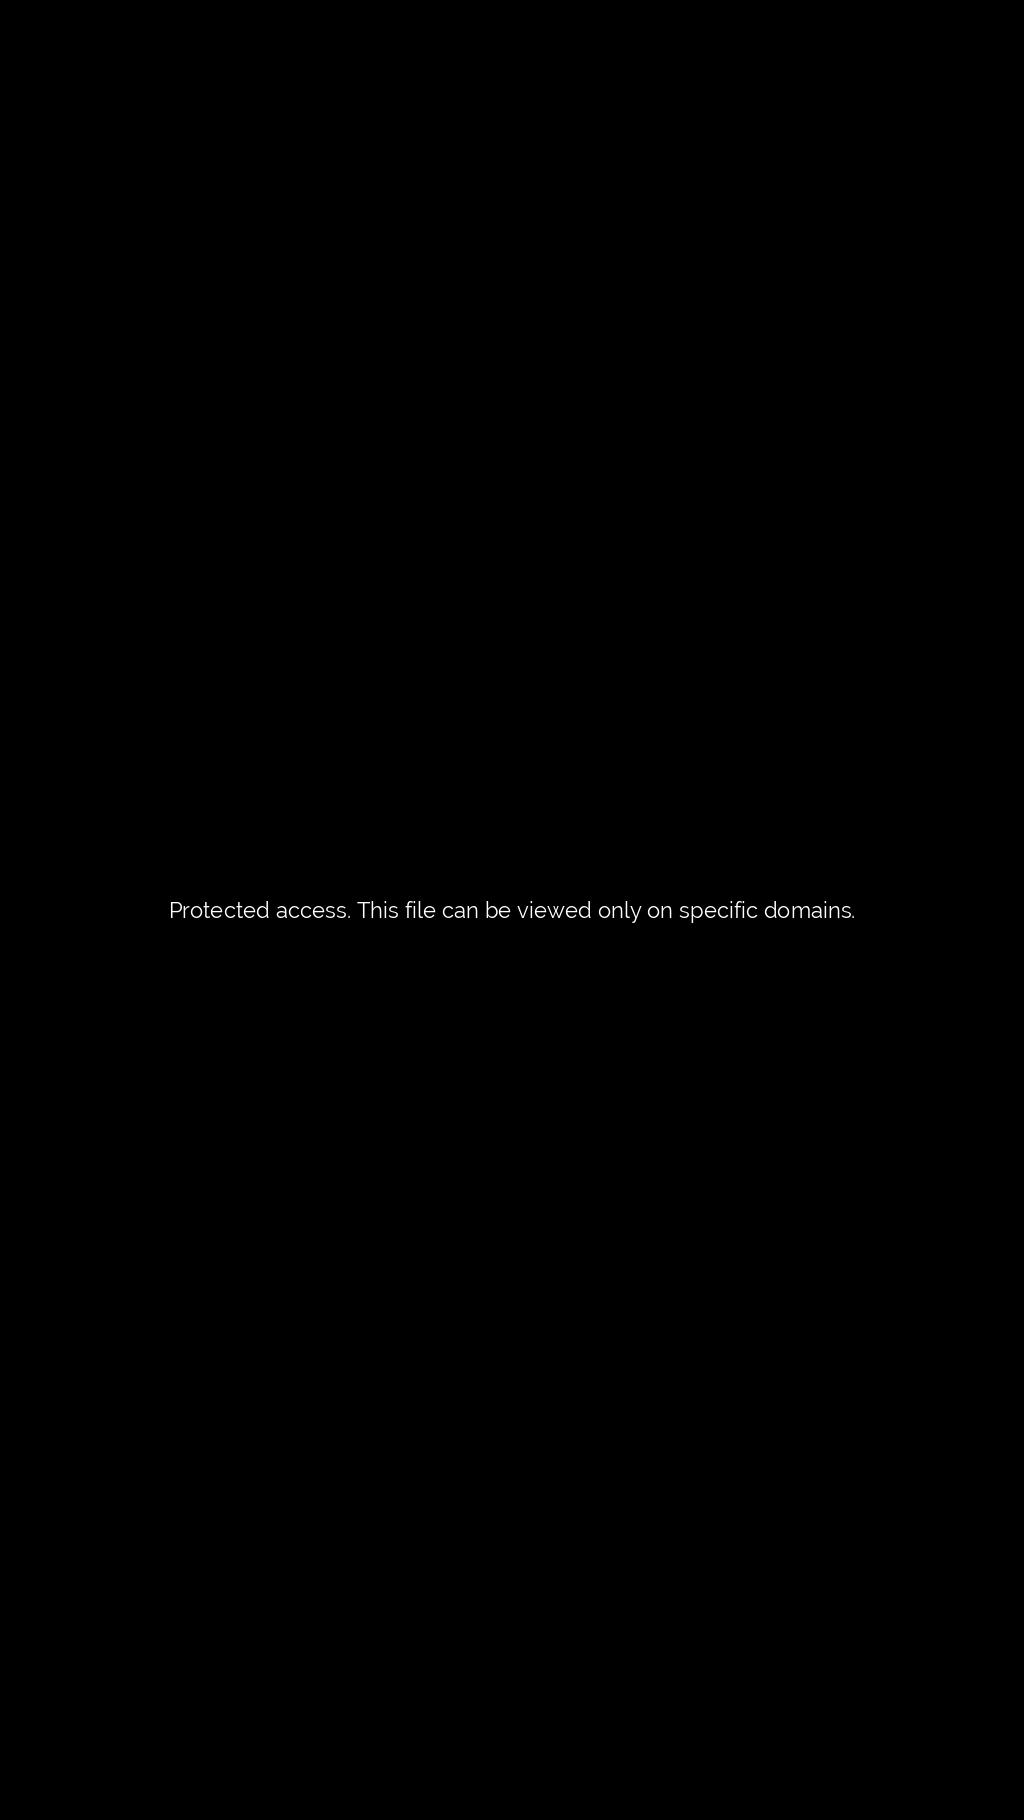 Instagram Story - Sharm El Sheikh Diving Guide